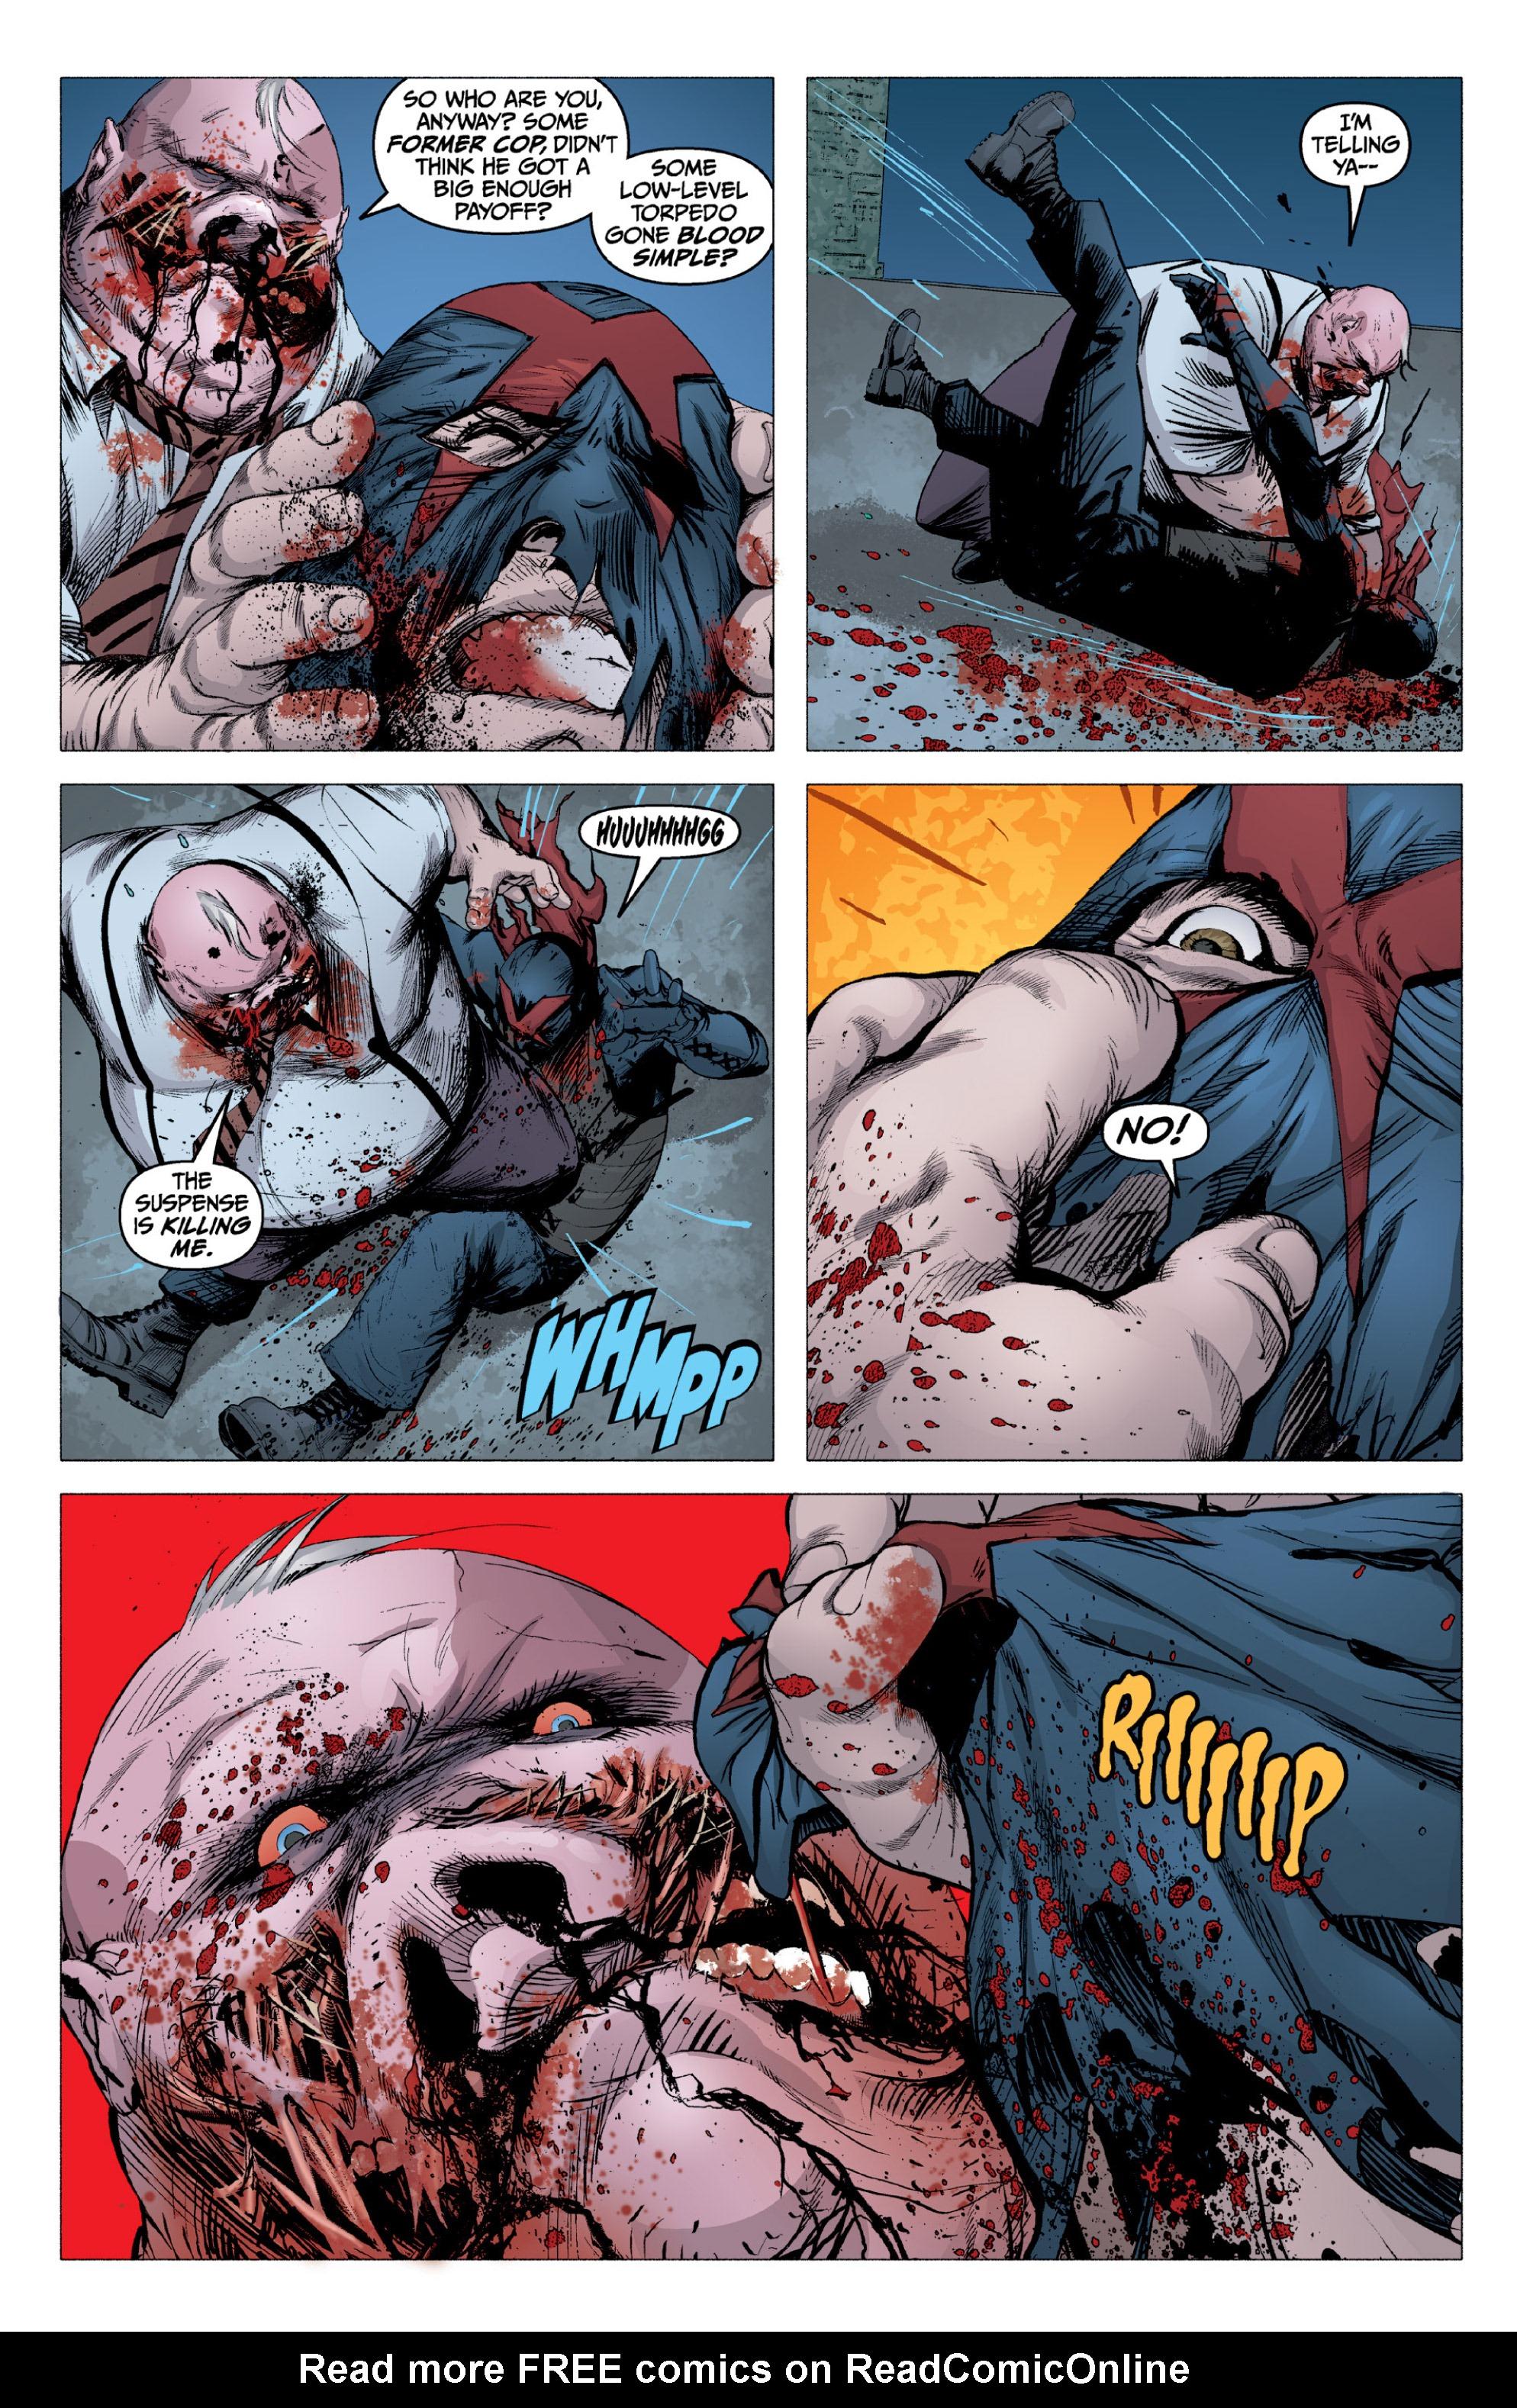 Read online X: Big Bad comic -  Issue # Full - 114